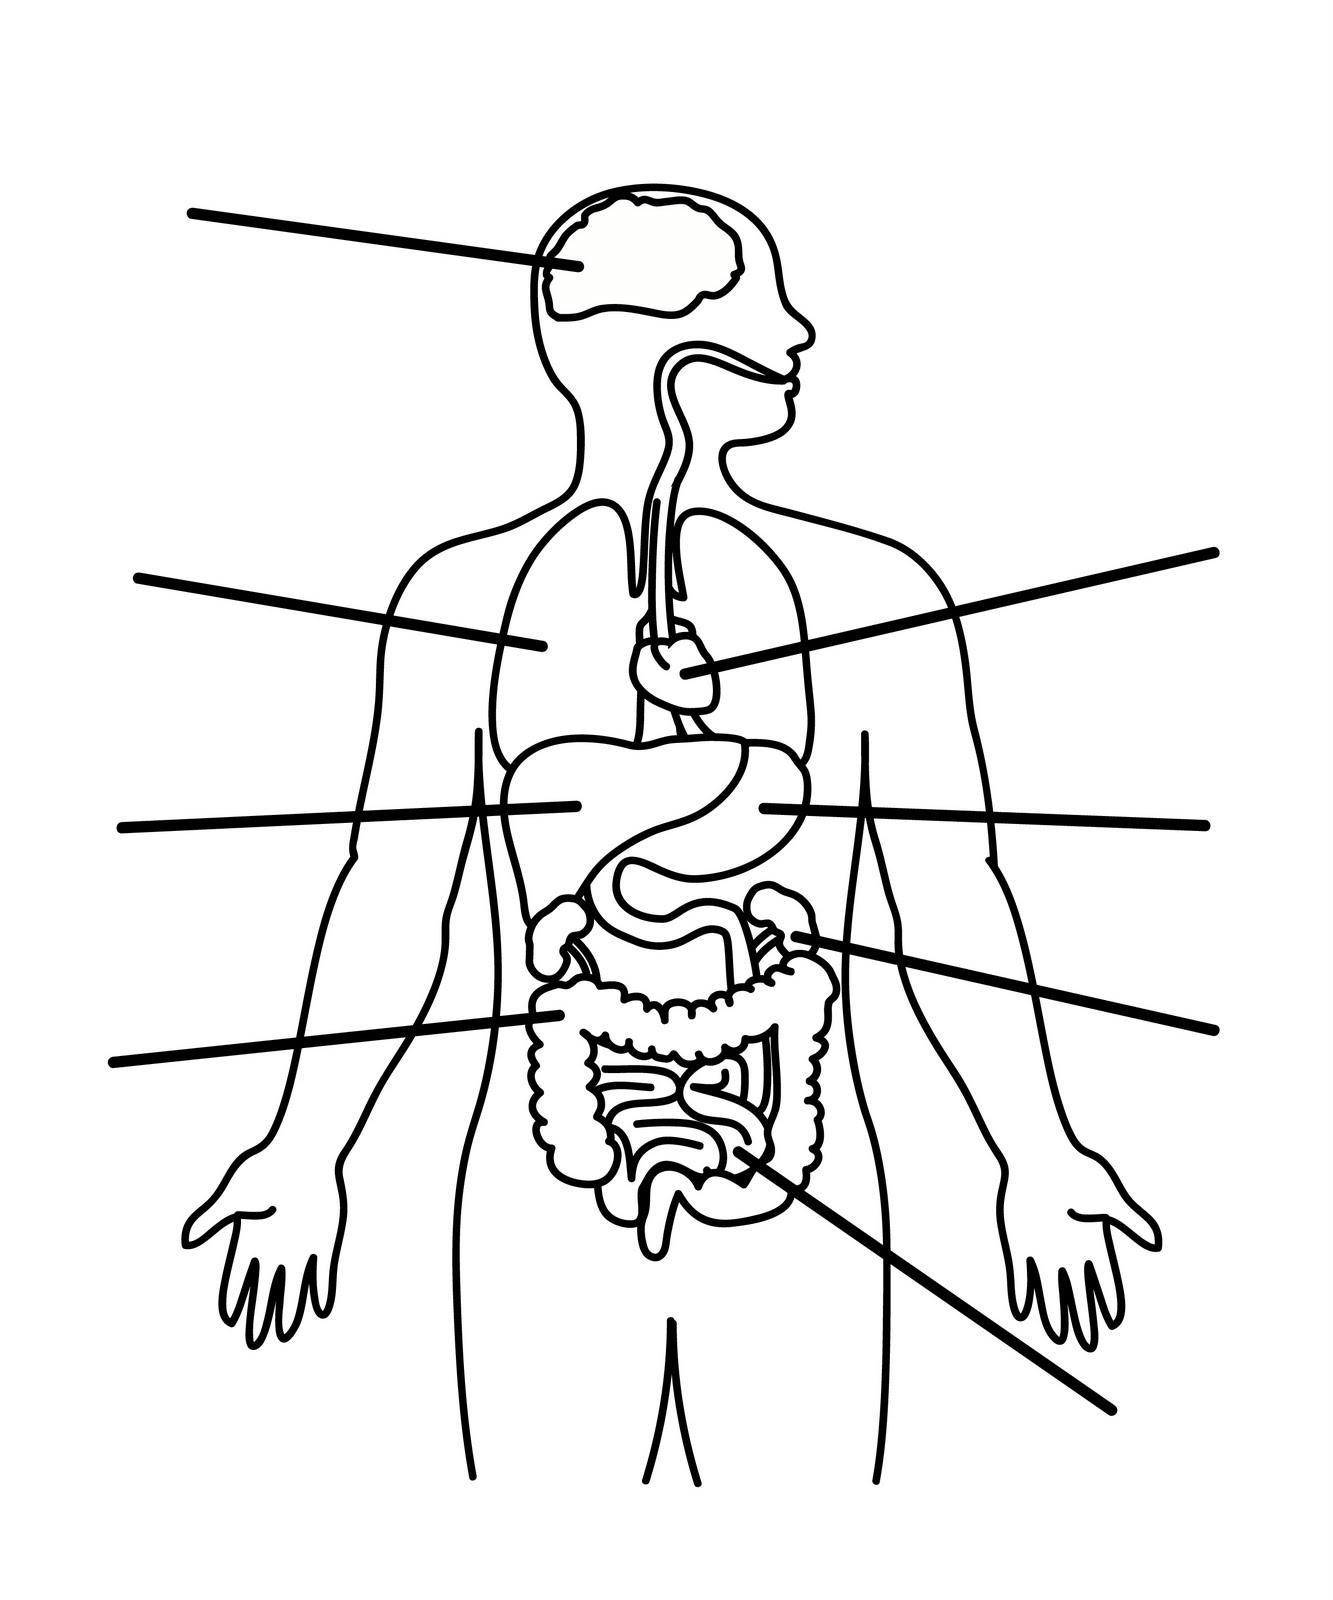 1333x1600 Outline Drawing Of Human Body Human Body Anatomy Outline Printable